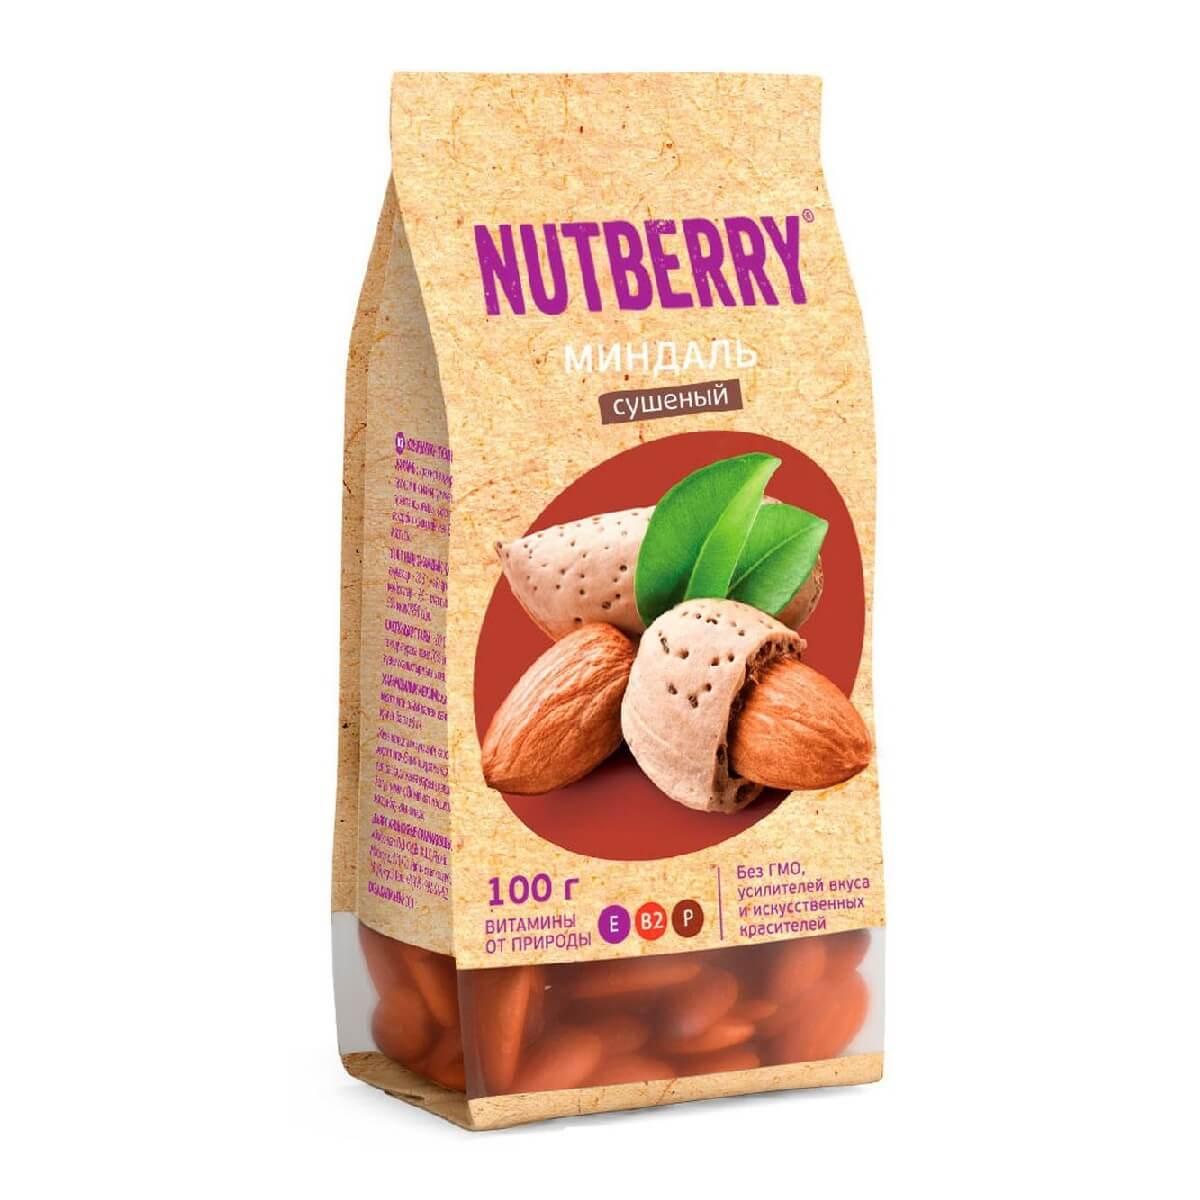 Nutberry миндаль сушеный 100гр.